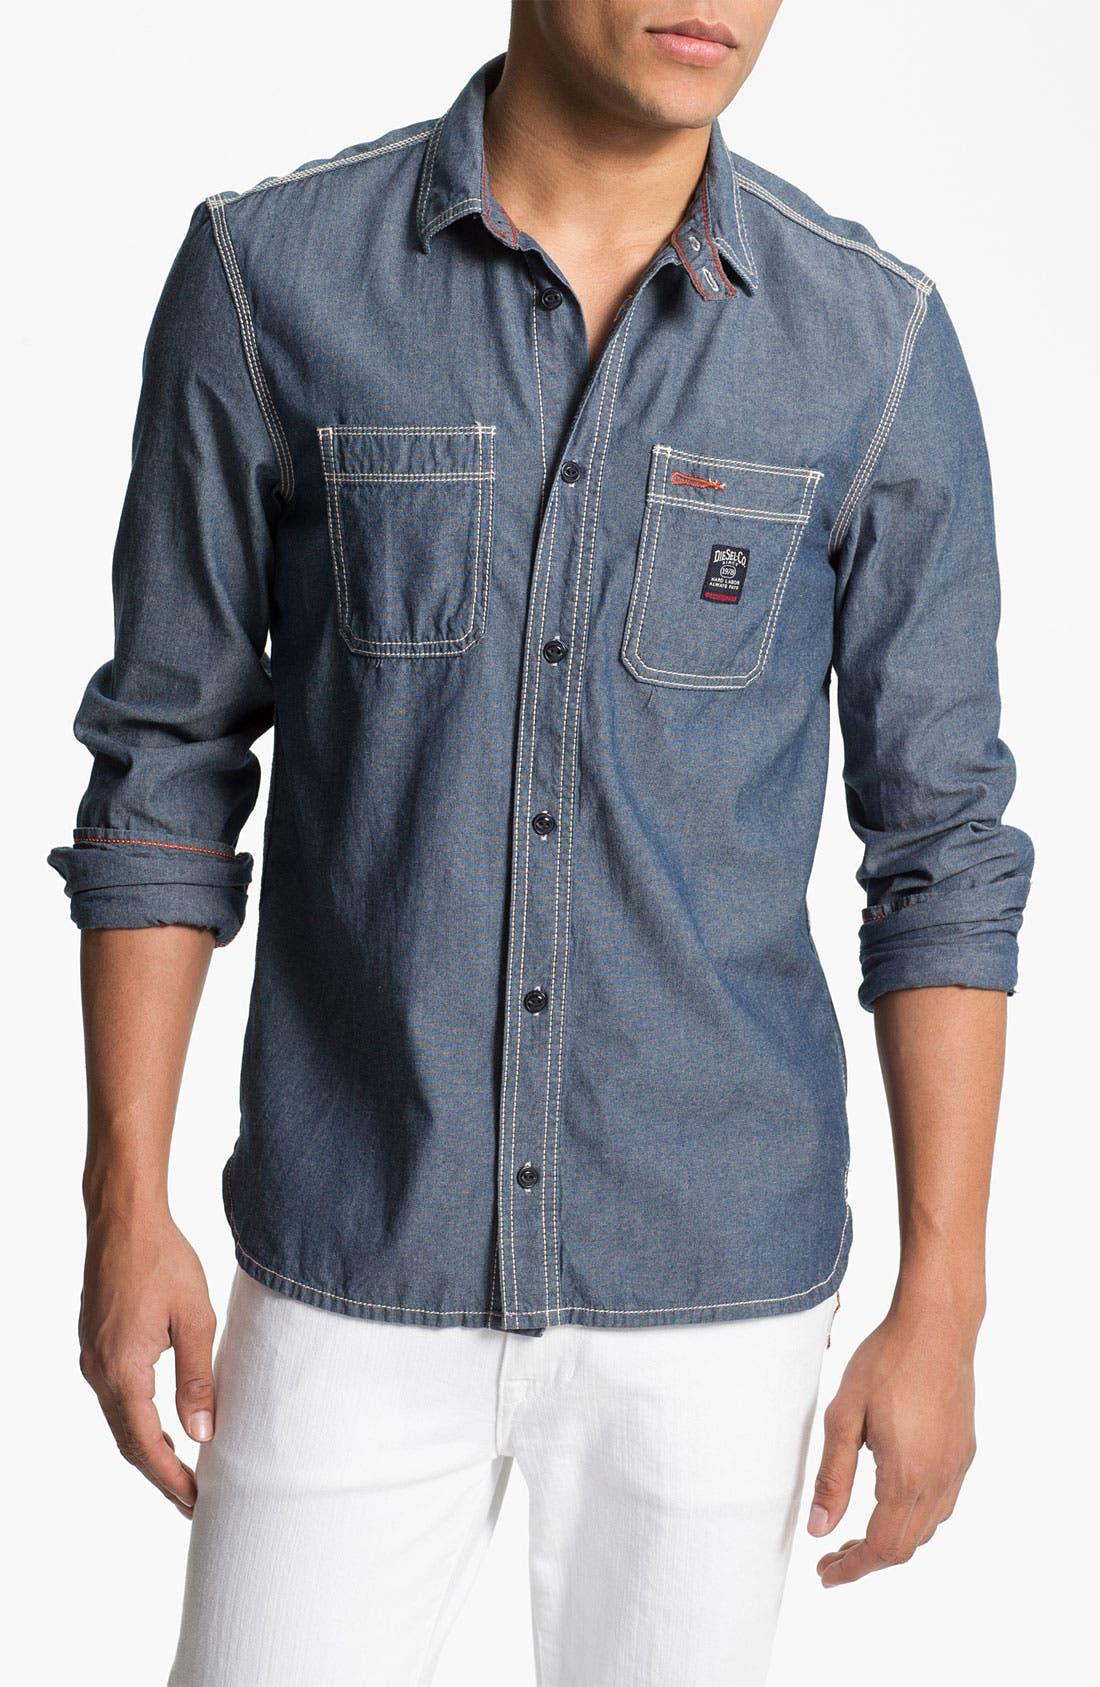 Main Image - DIESEL® 'Stepy' Chambray Cotton Shirt